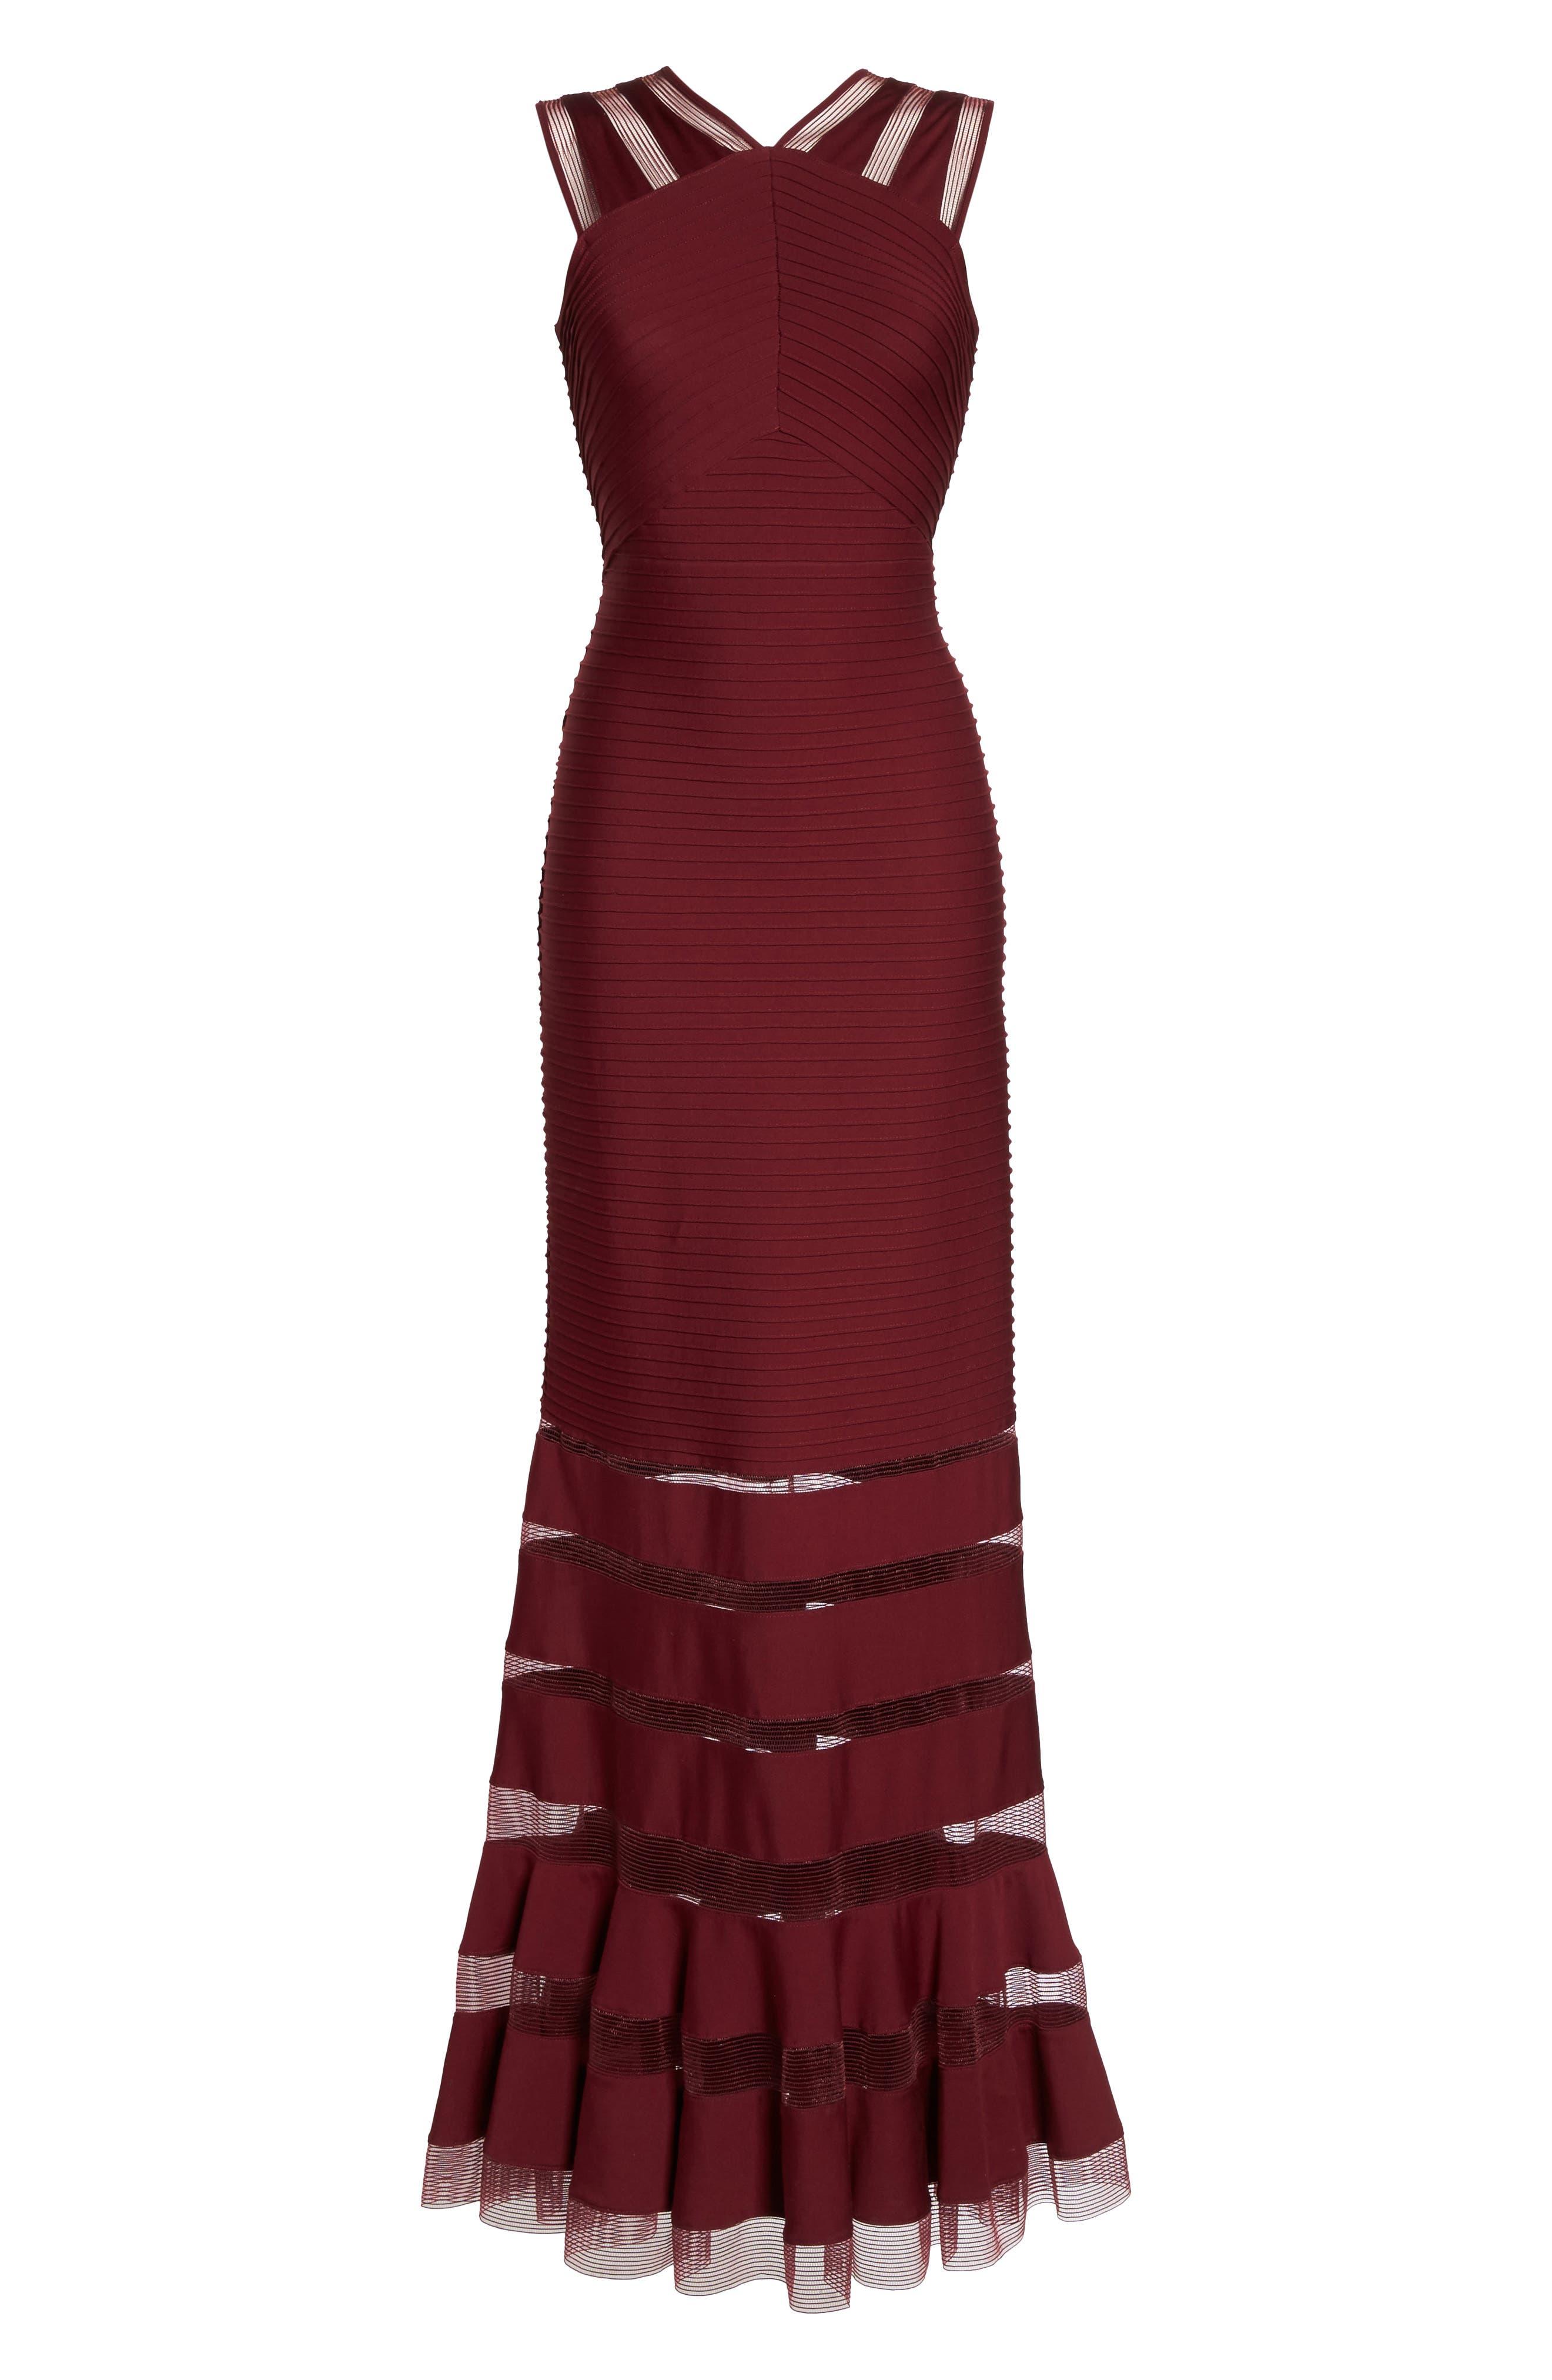 Mesh Inset Pintuck Dress,                             Alternate thumbnail 6, color,                             600